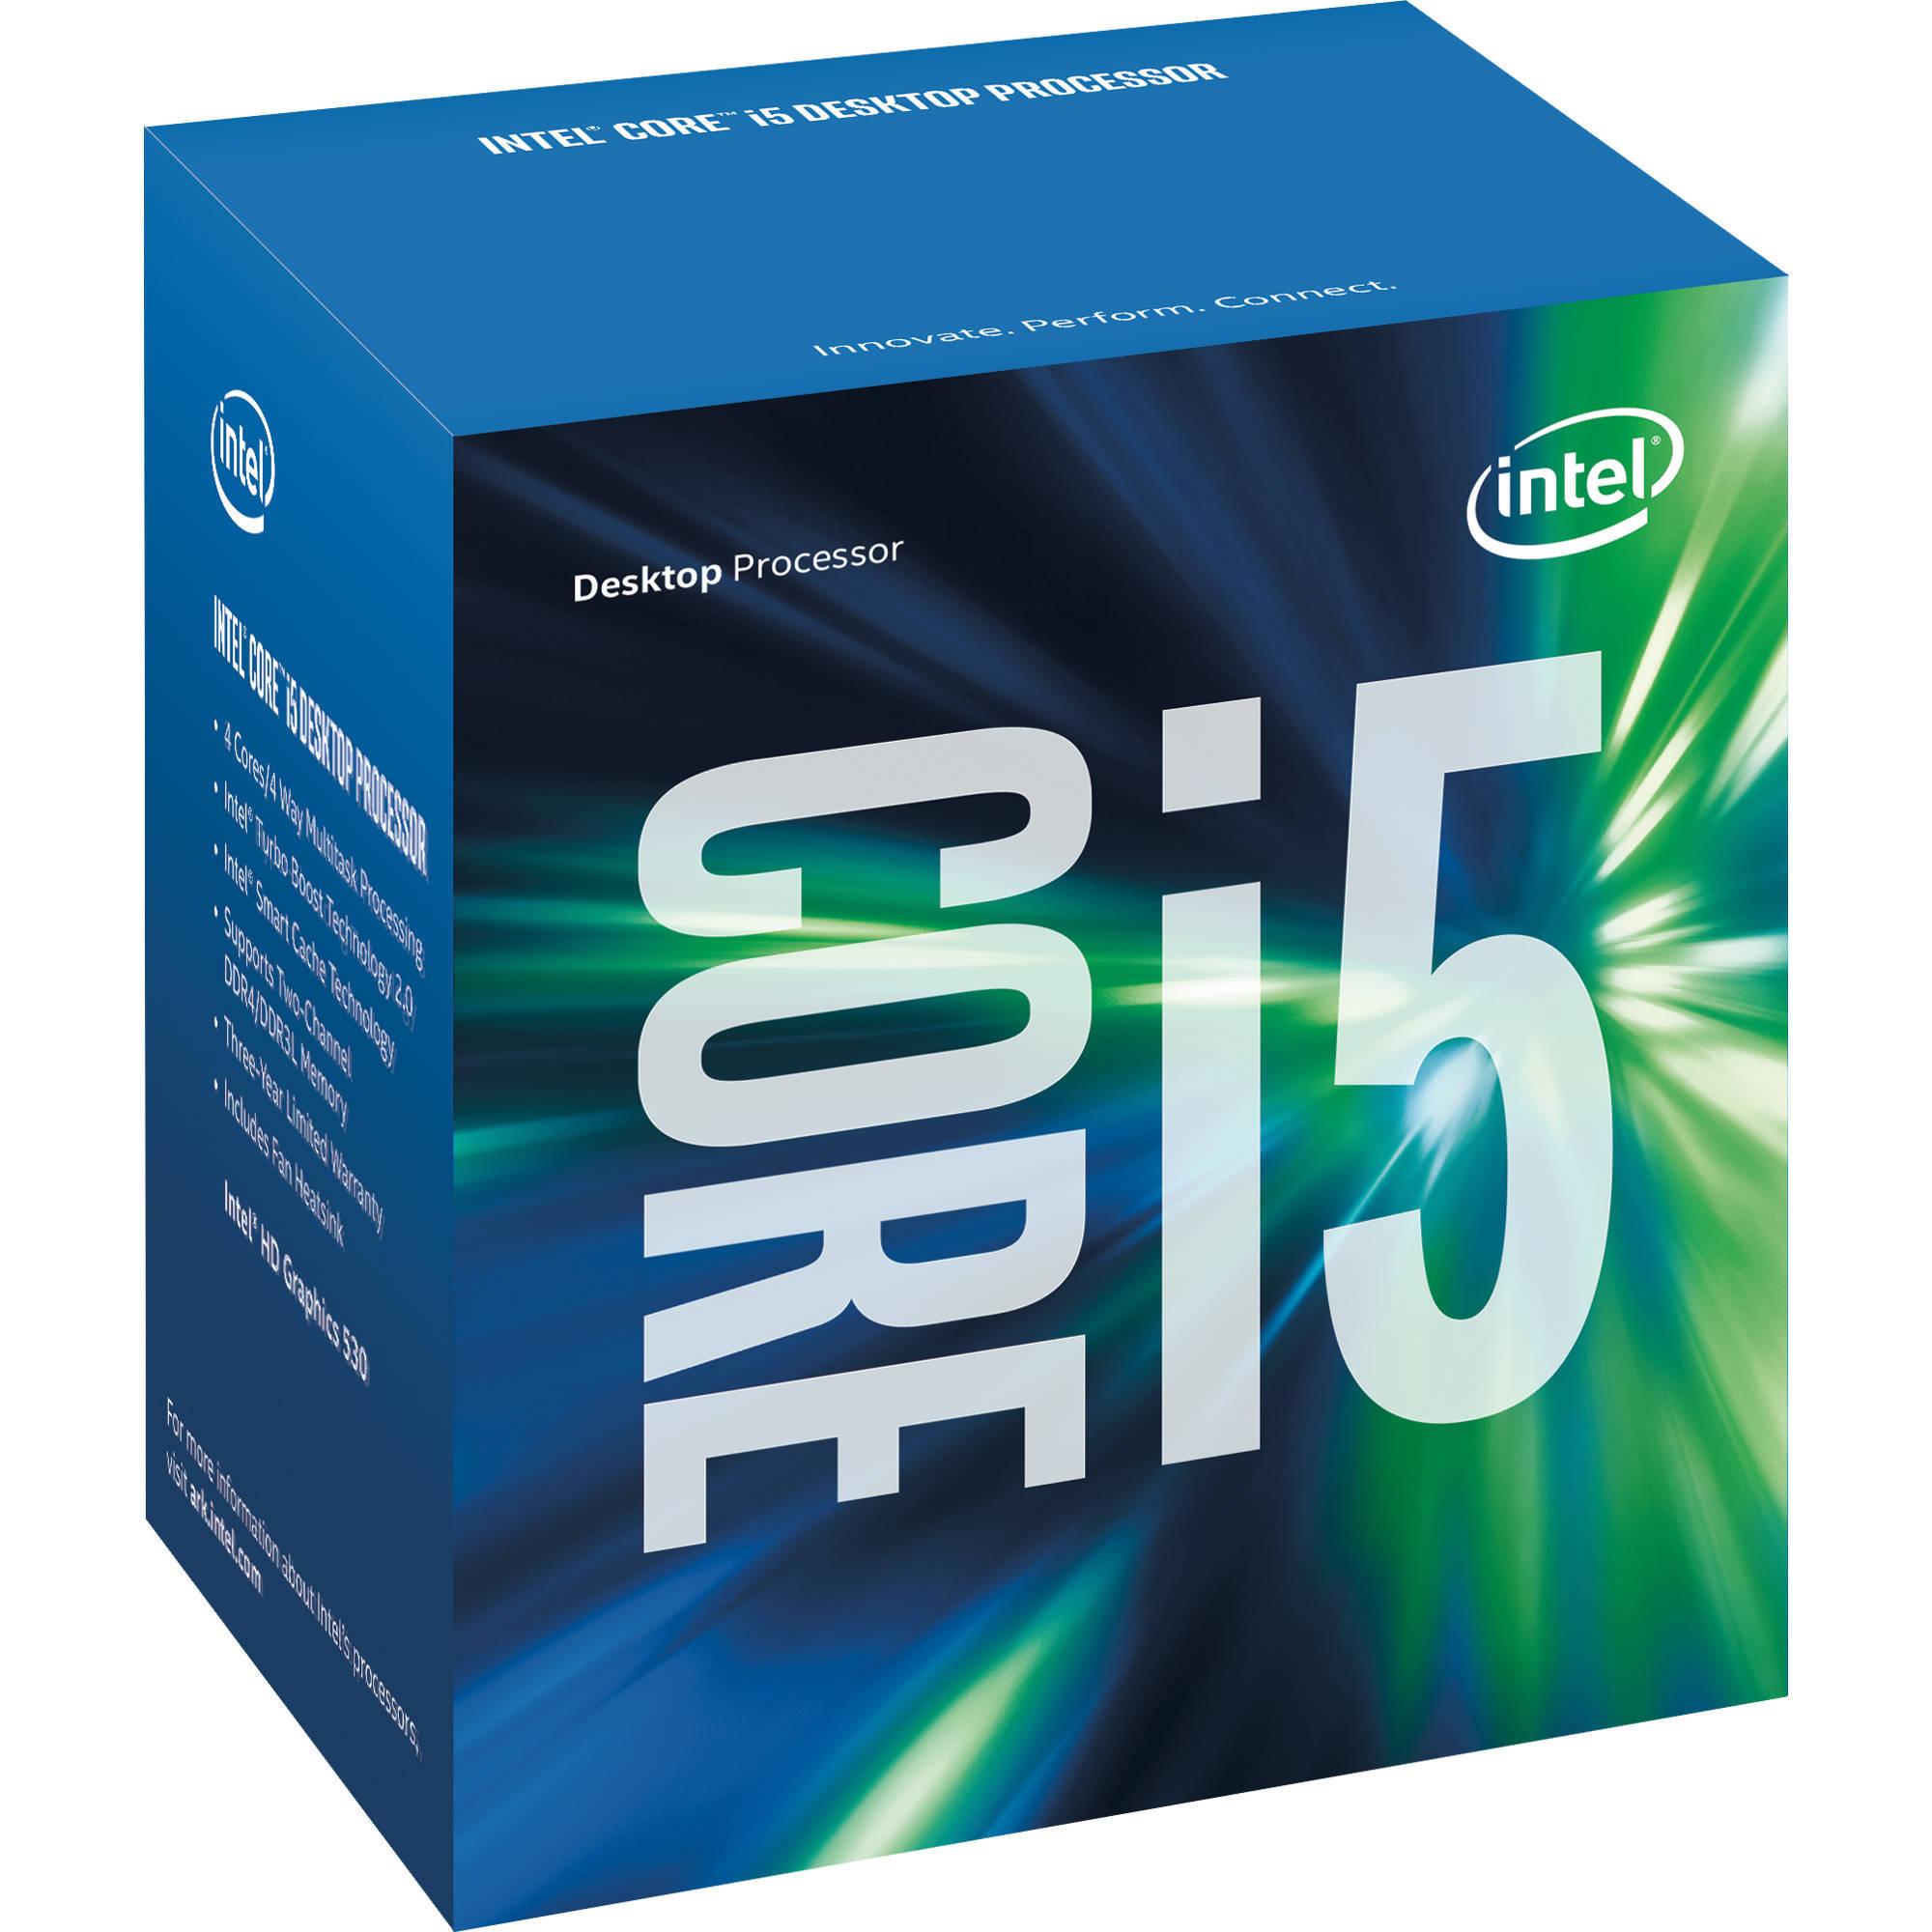 Intel Core i5/ /6500/3,2/gHz LGA1151/6/MB Cache Tray C